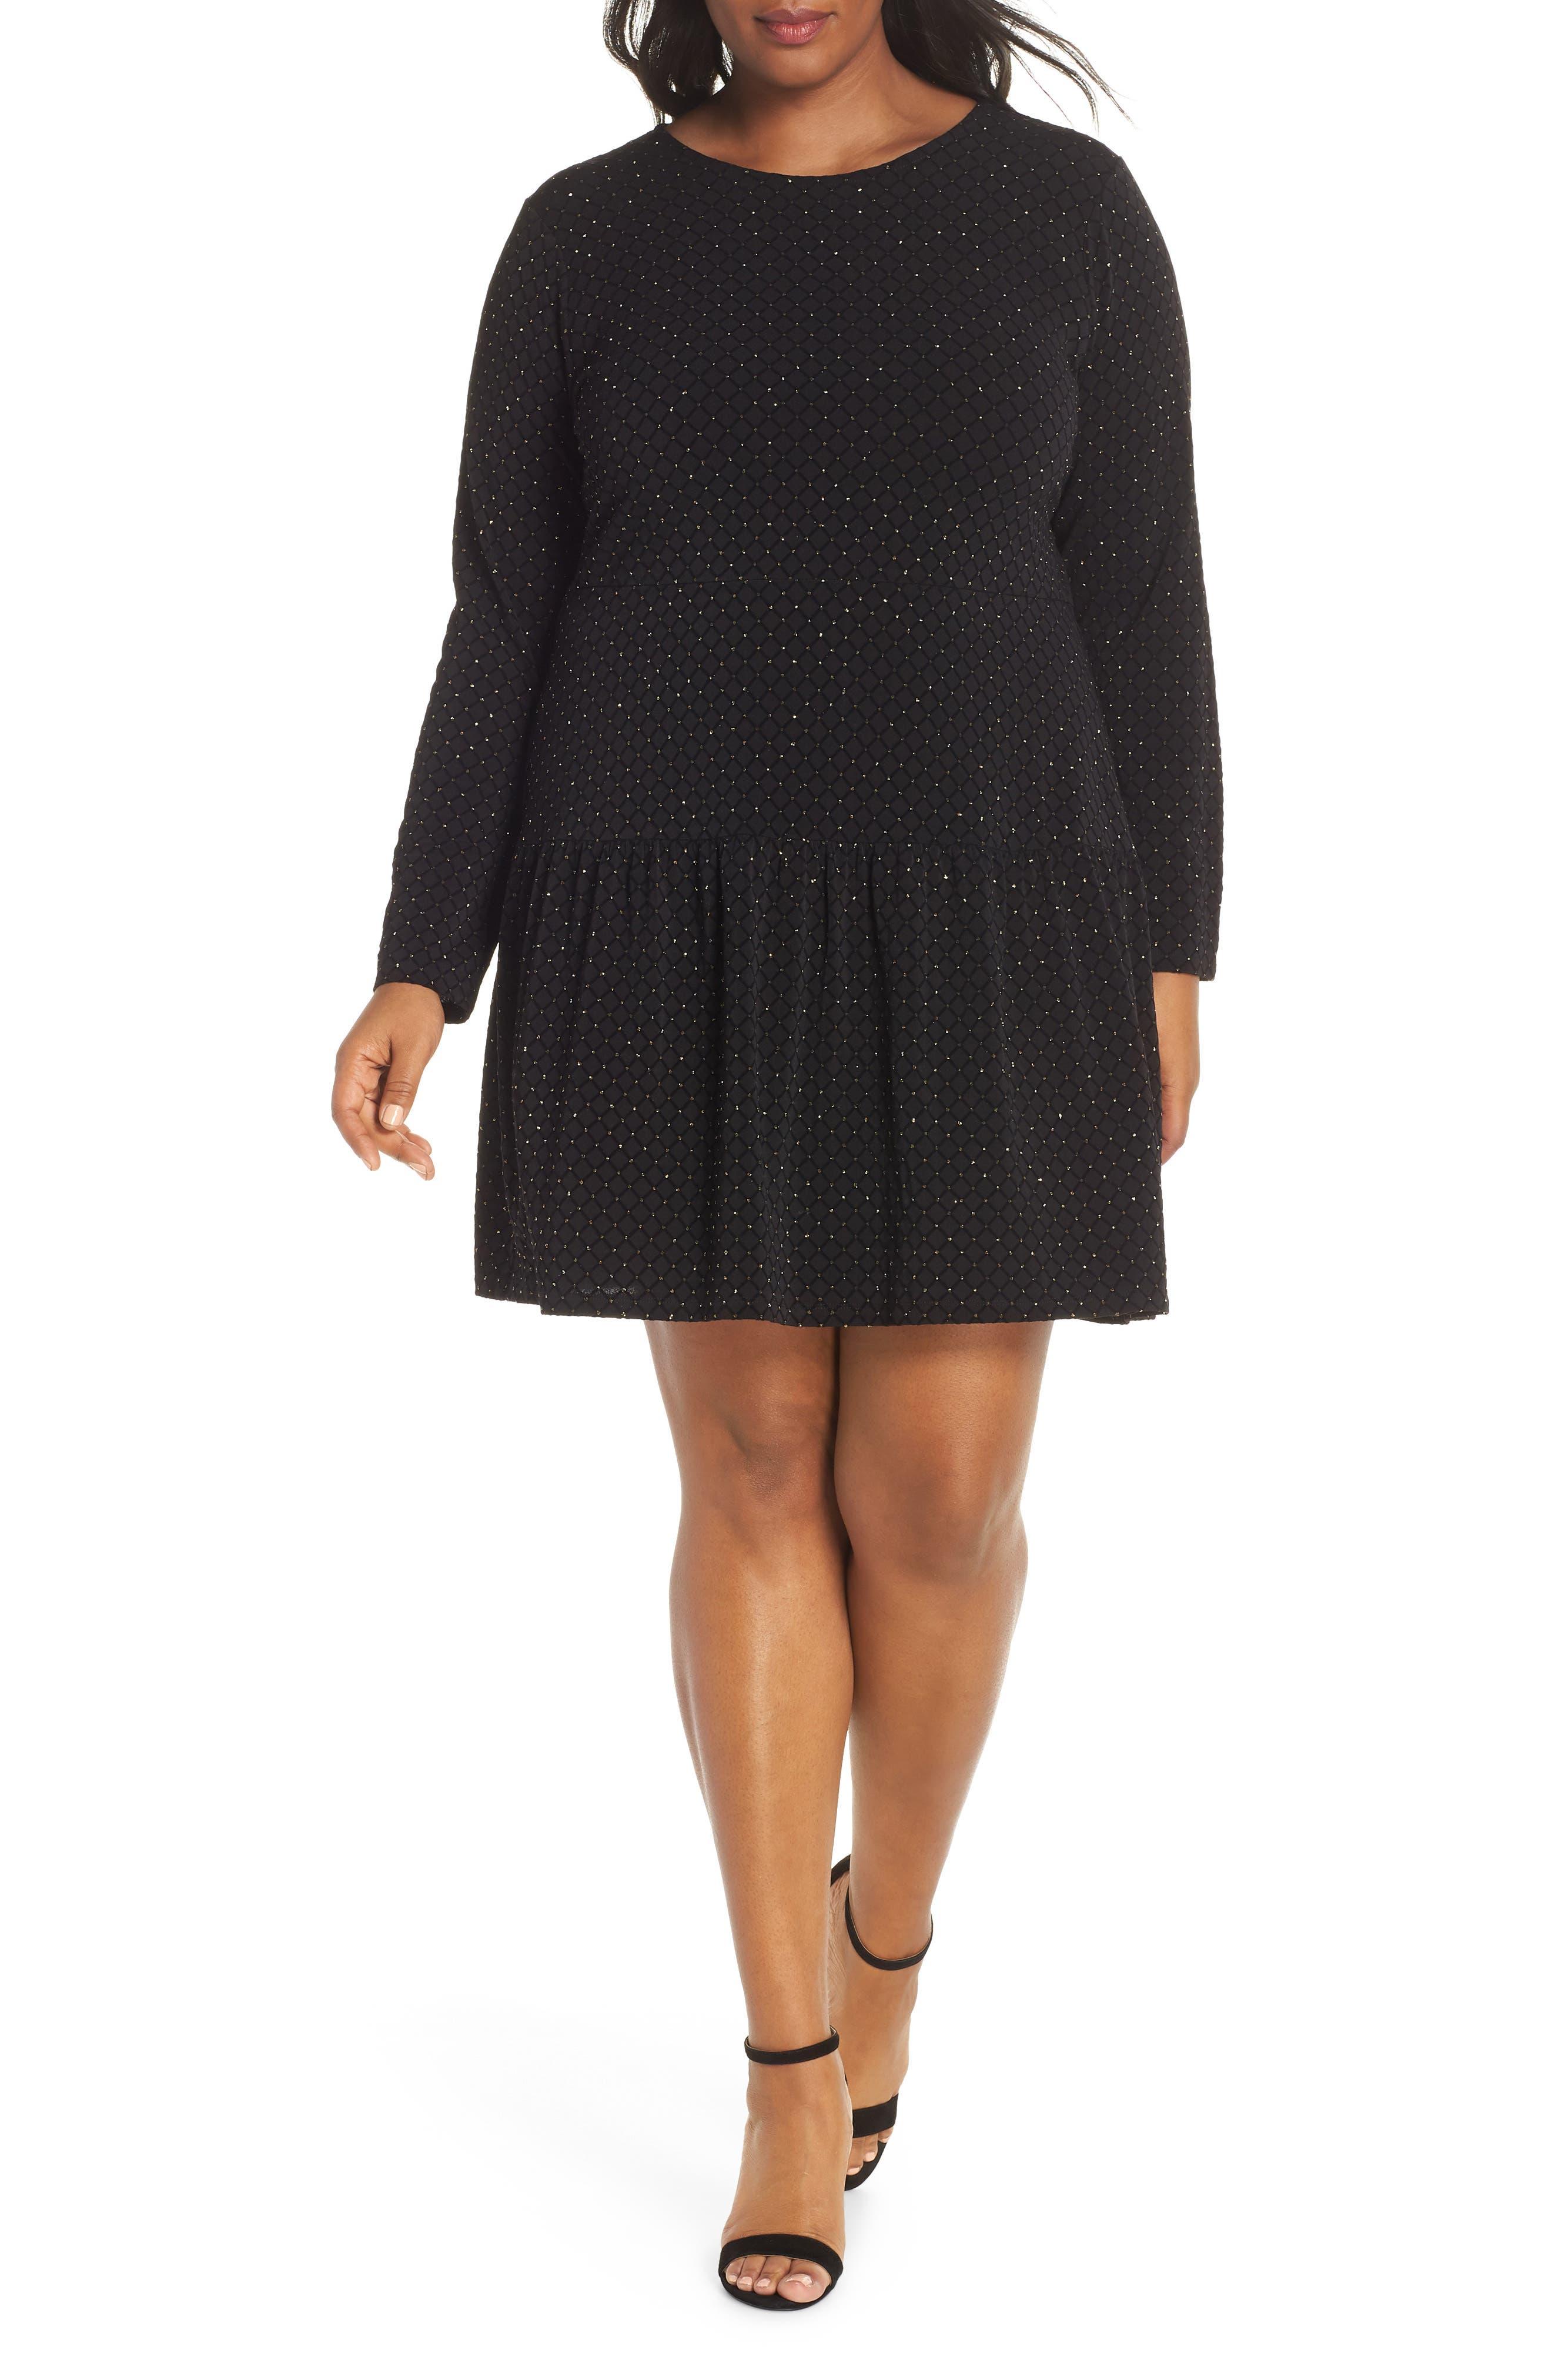 Long Sleeve Pleated Skirt Dress,                             Main thumbnail 1, color,                             BLACK/ GOLD